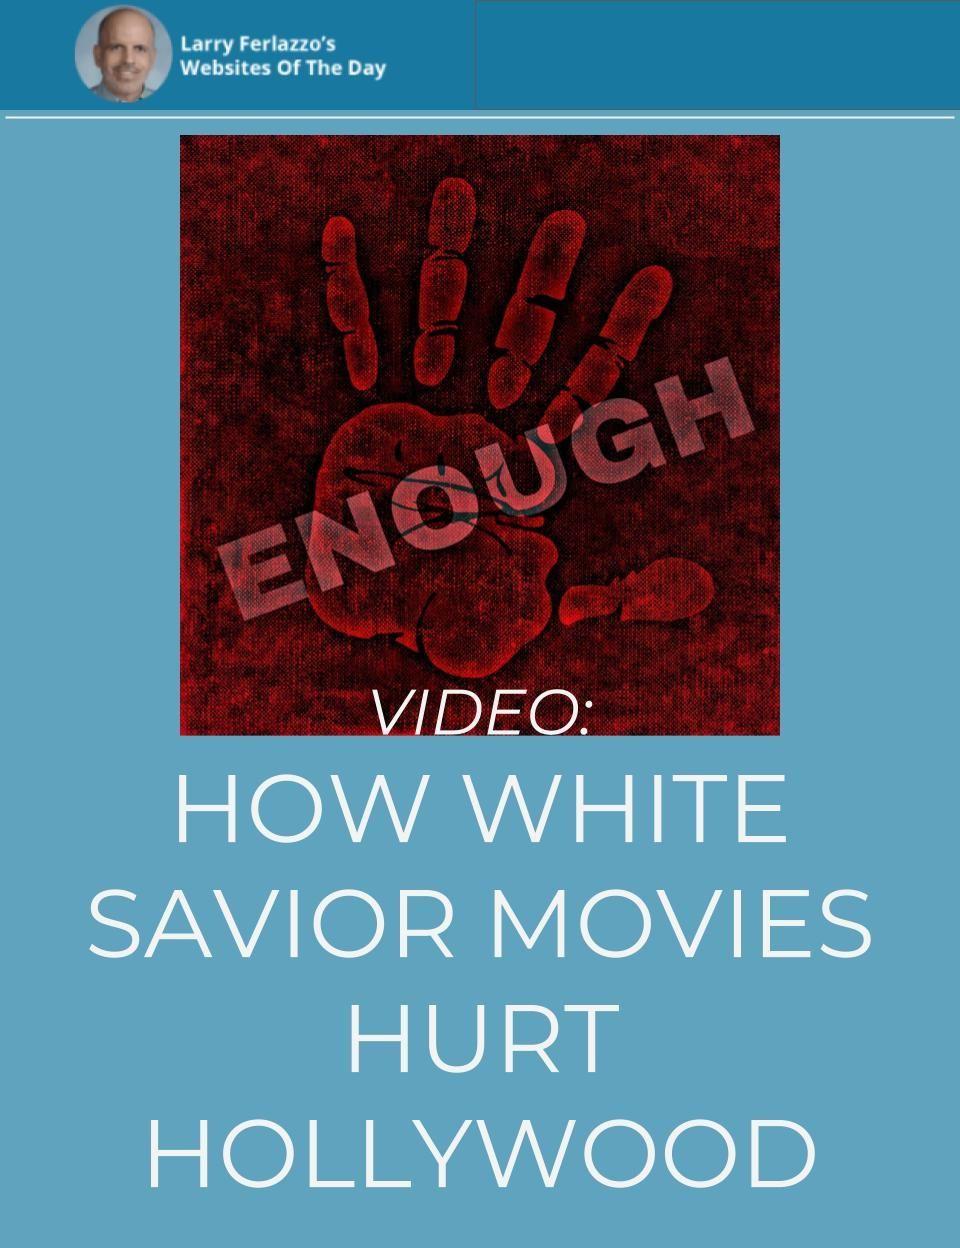 seth meyers white savior